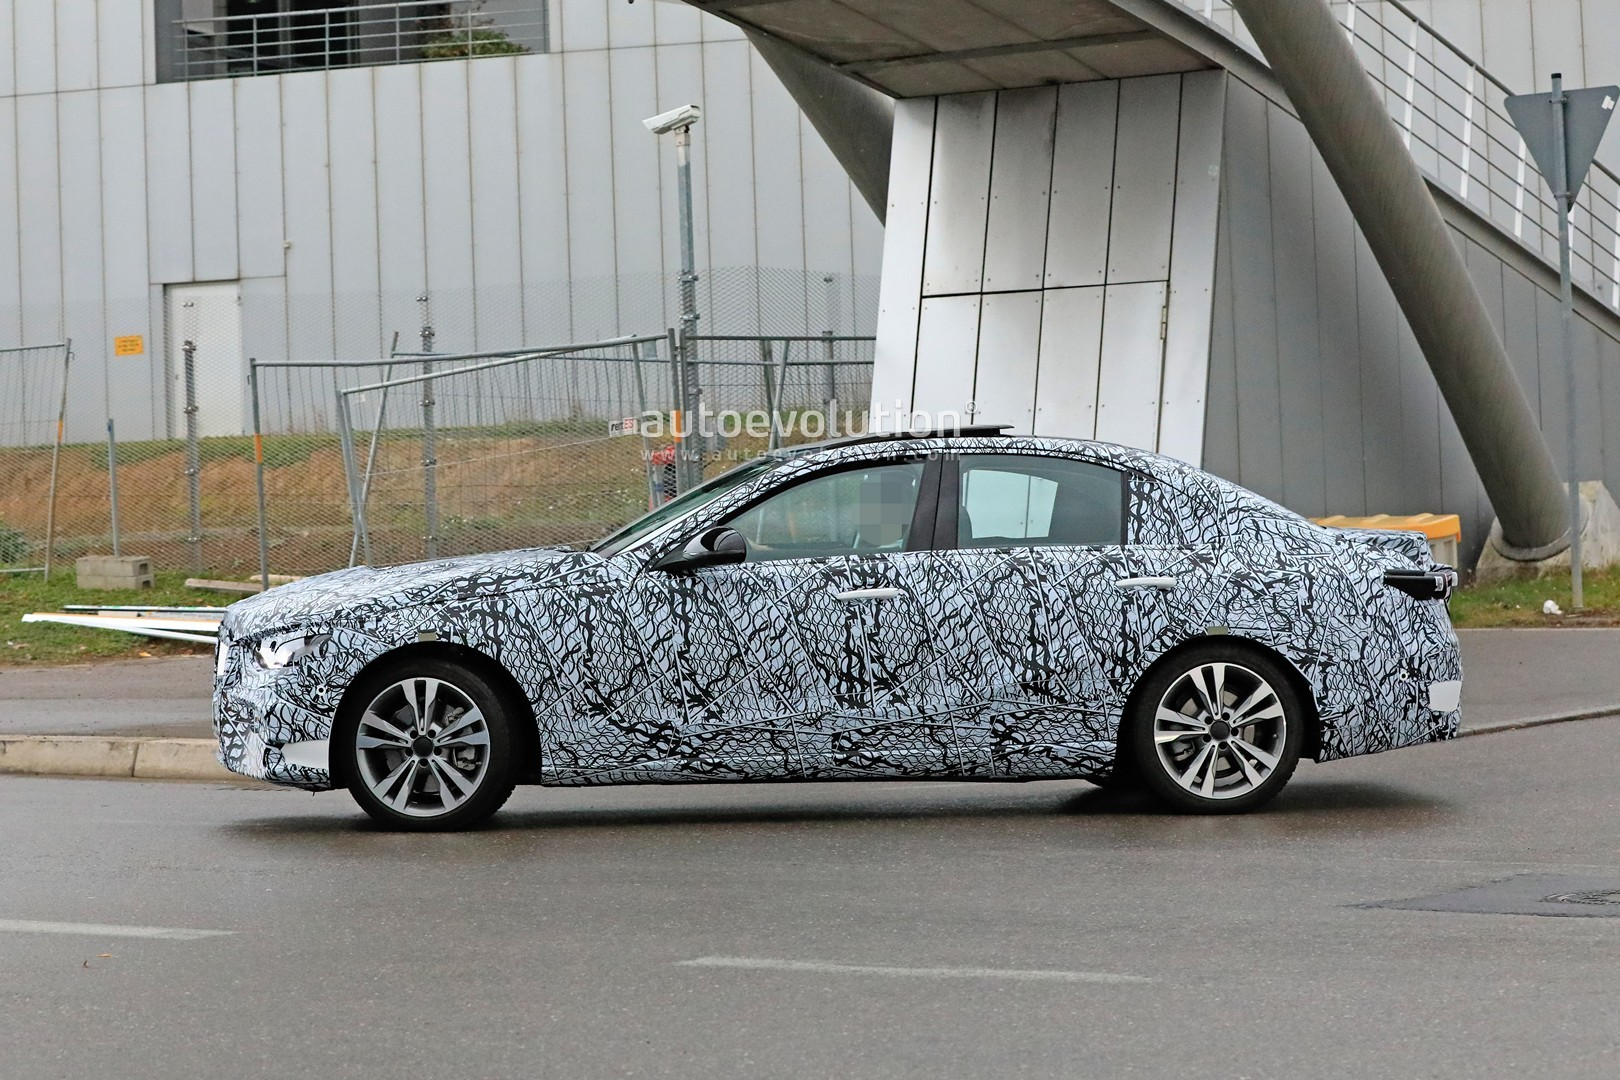 2021 Mercedes-Benz C-Class Sedan (W206) Makes Spyshots ...